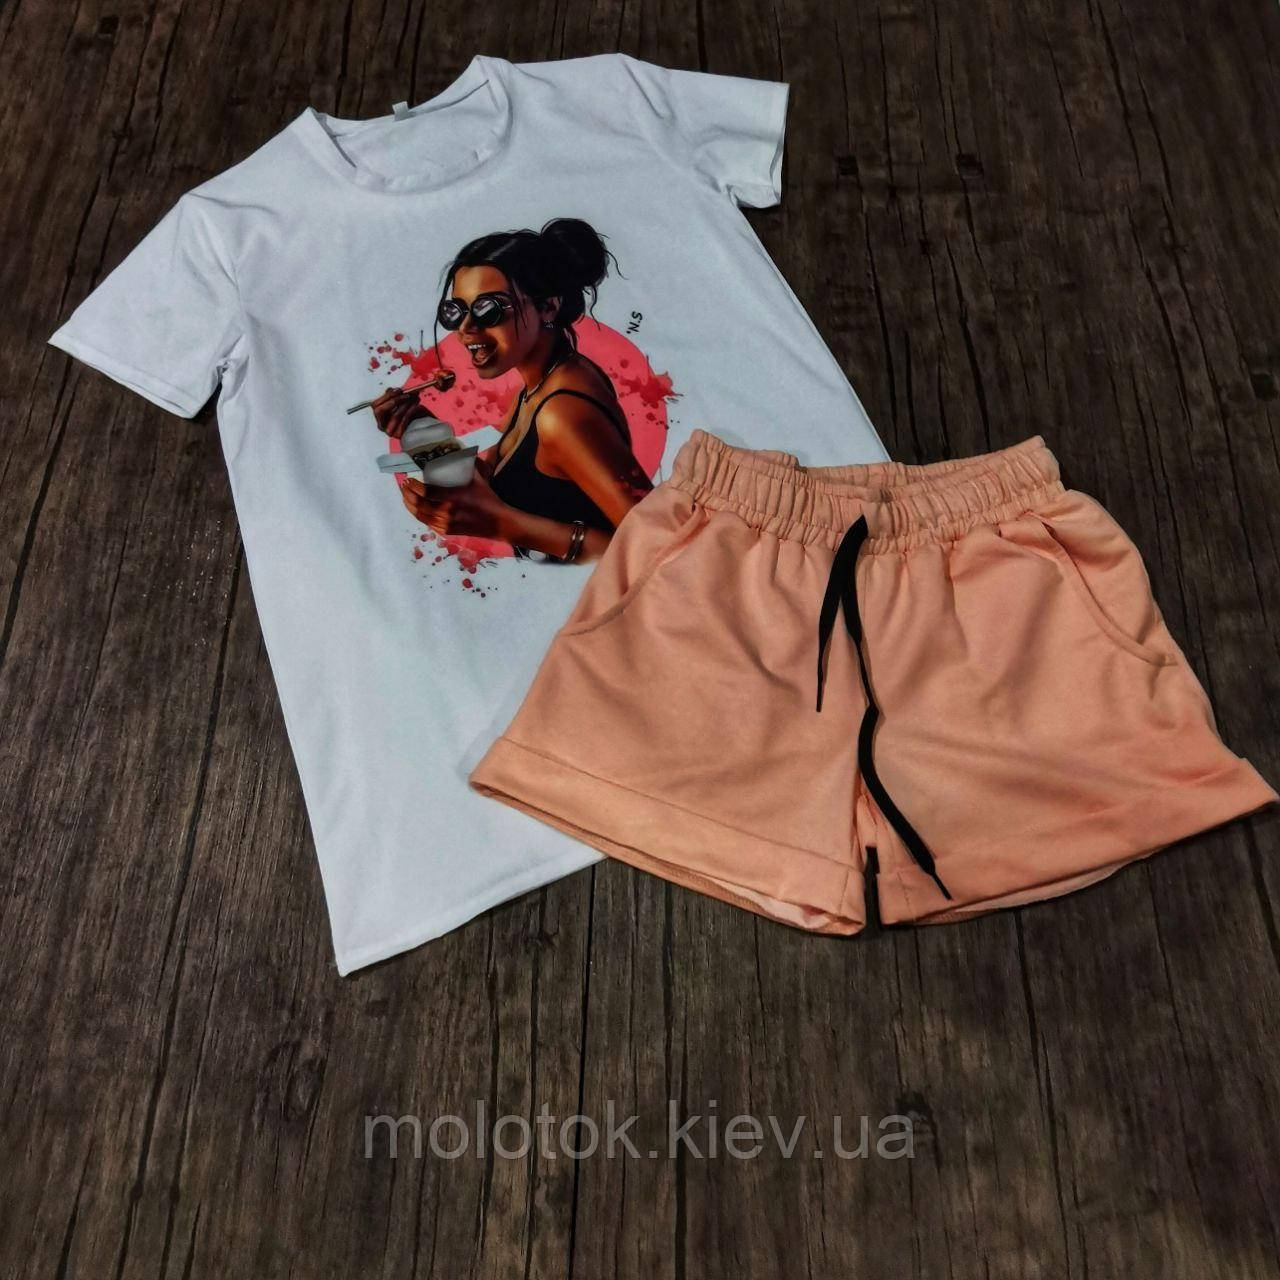 Модный женский комплект футболка Swag ice